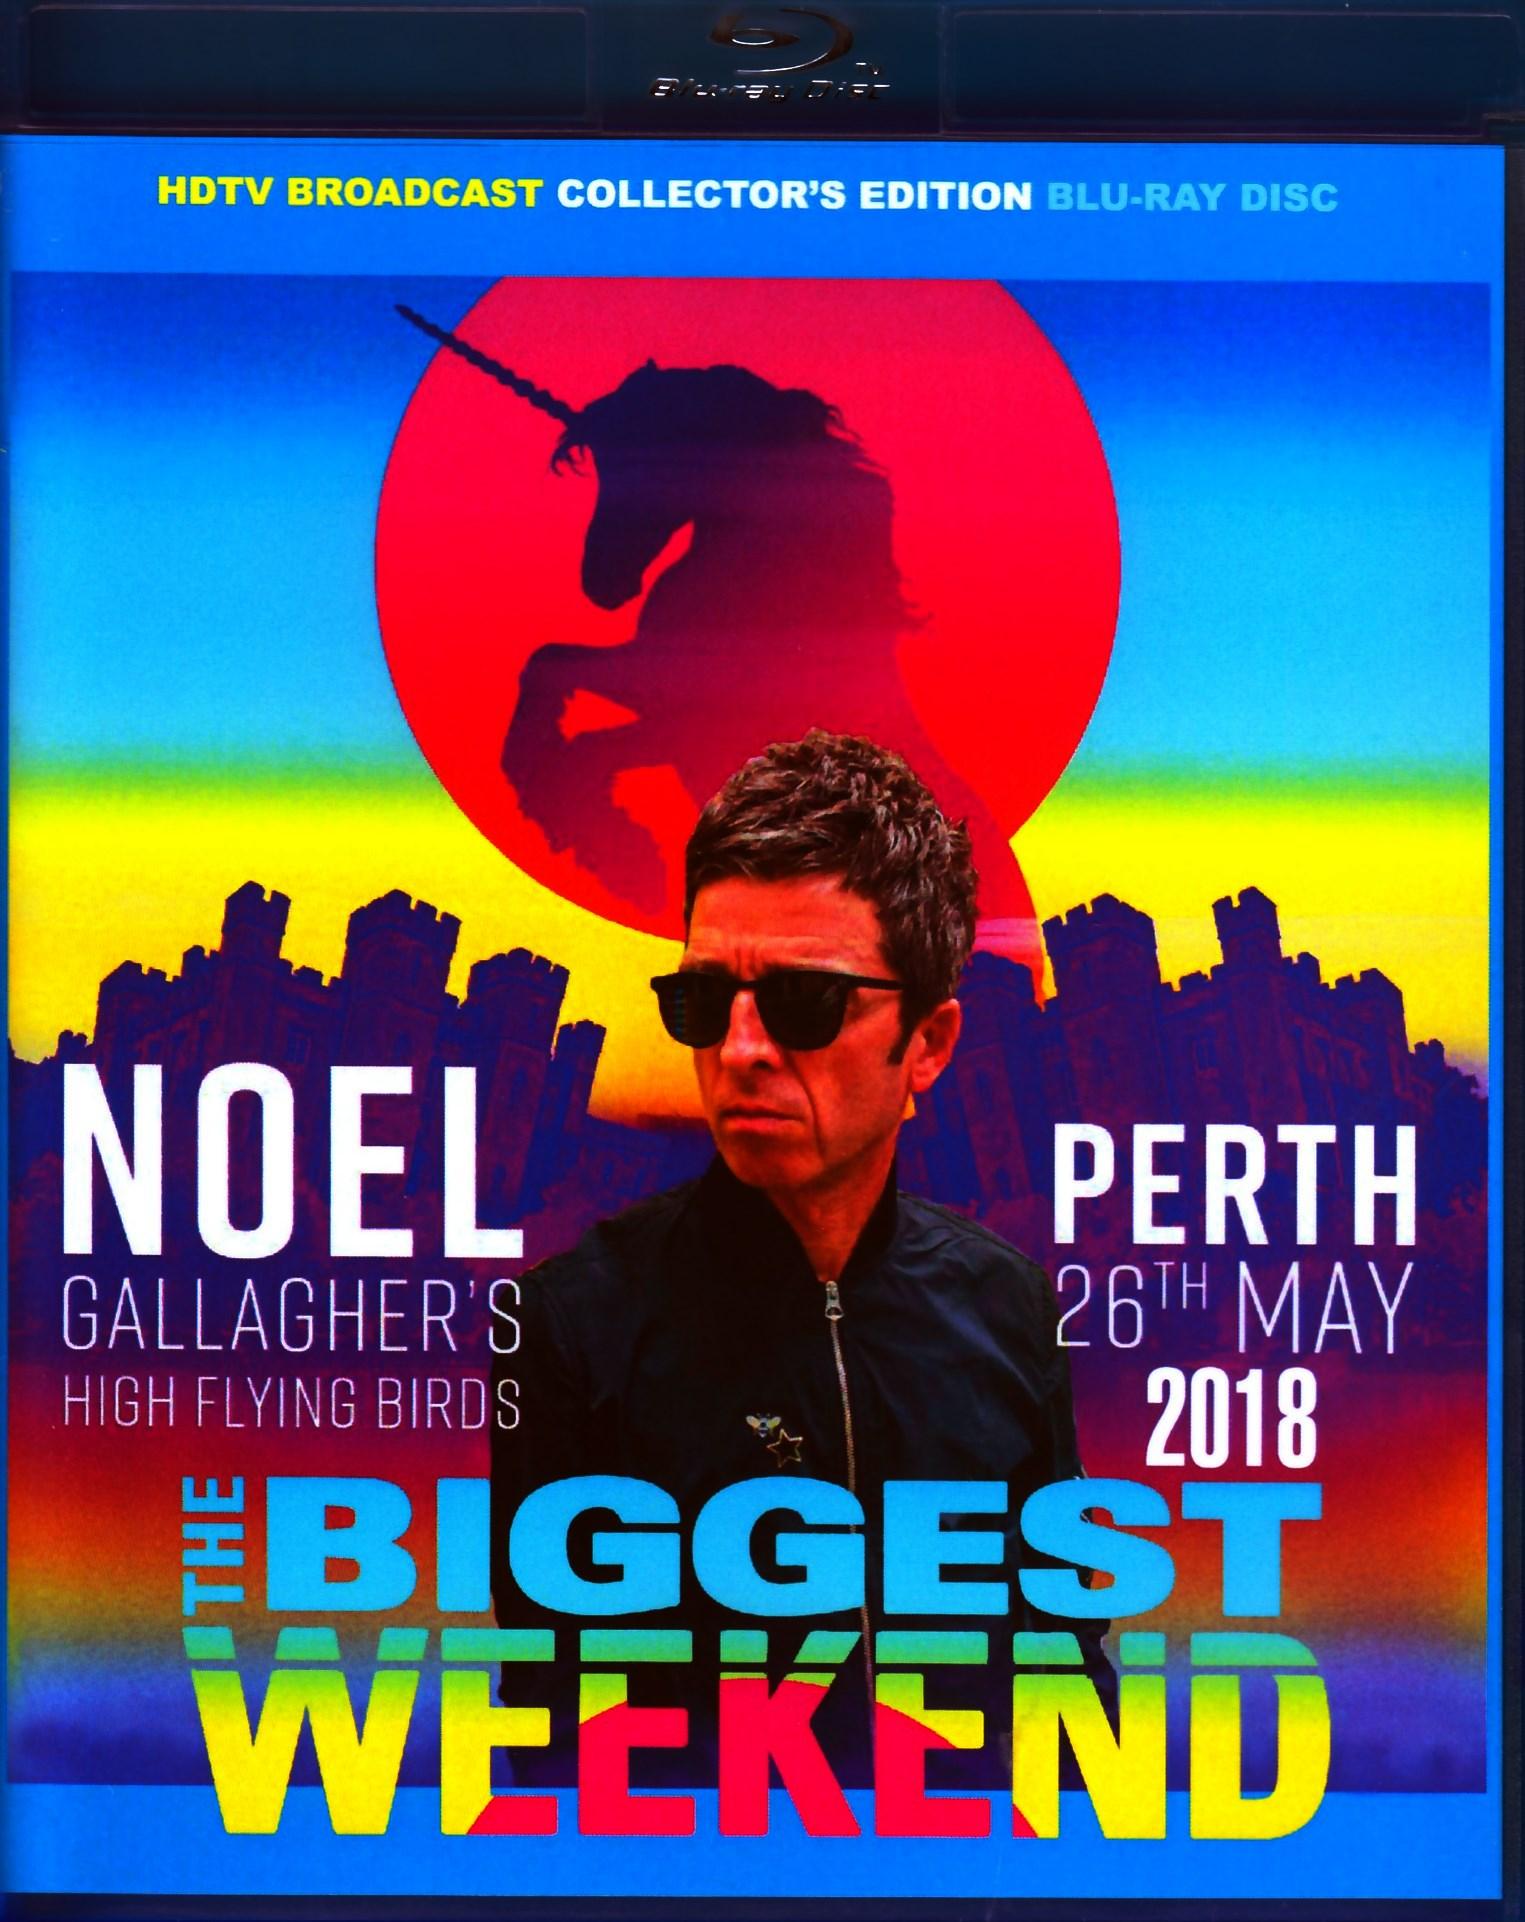 Noel Gallagher ノエル・ギャラガー/Scotland,UK 2018 Blu-Ray Ver.